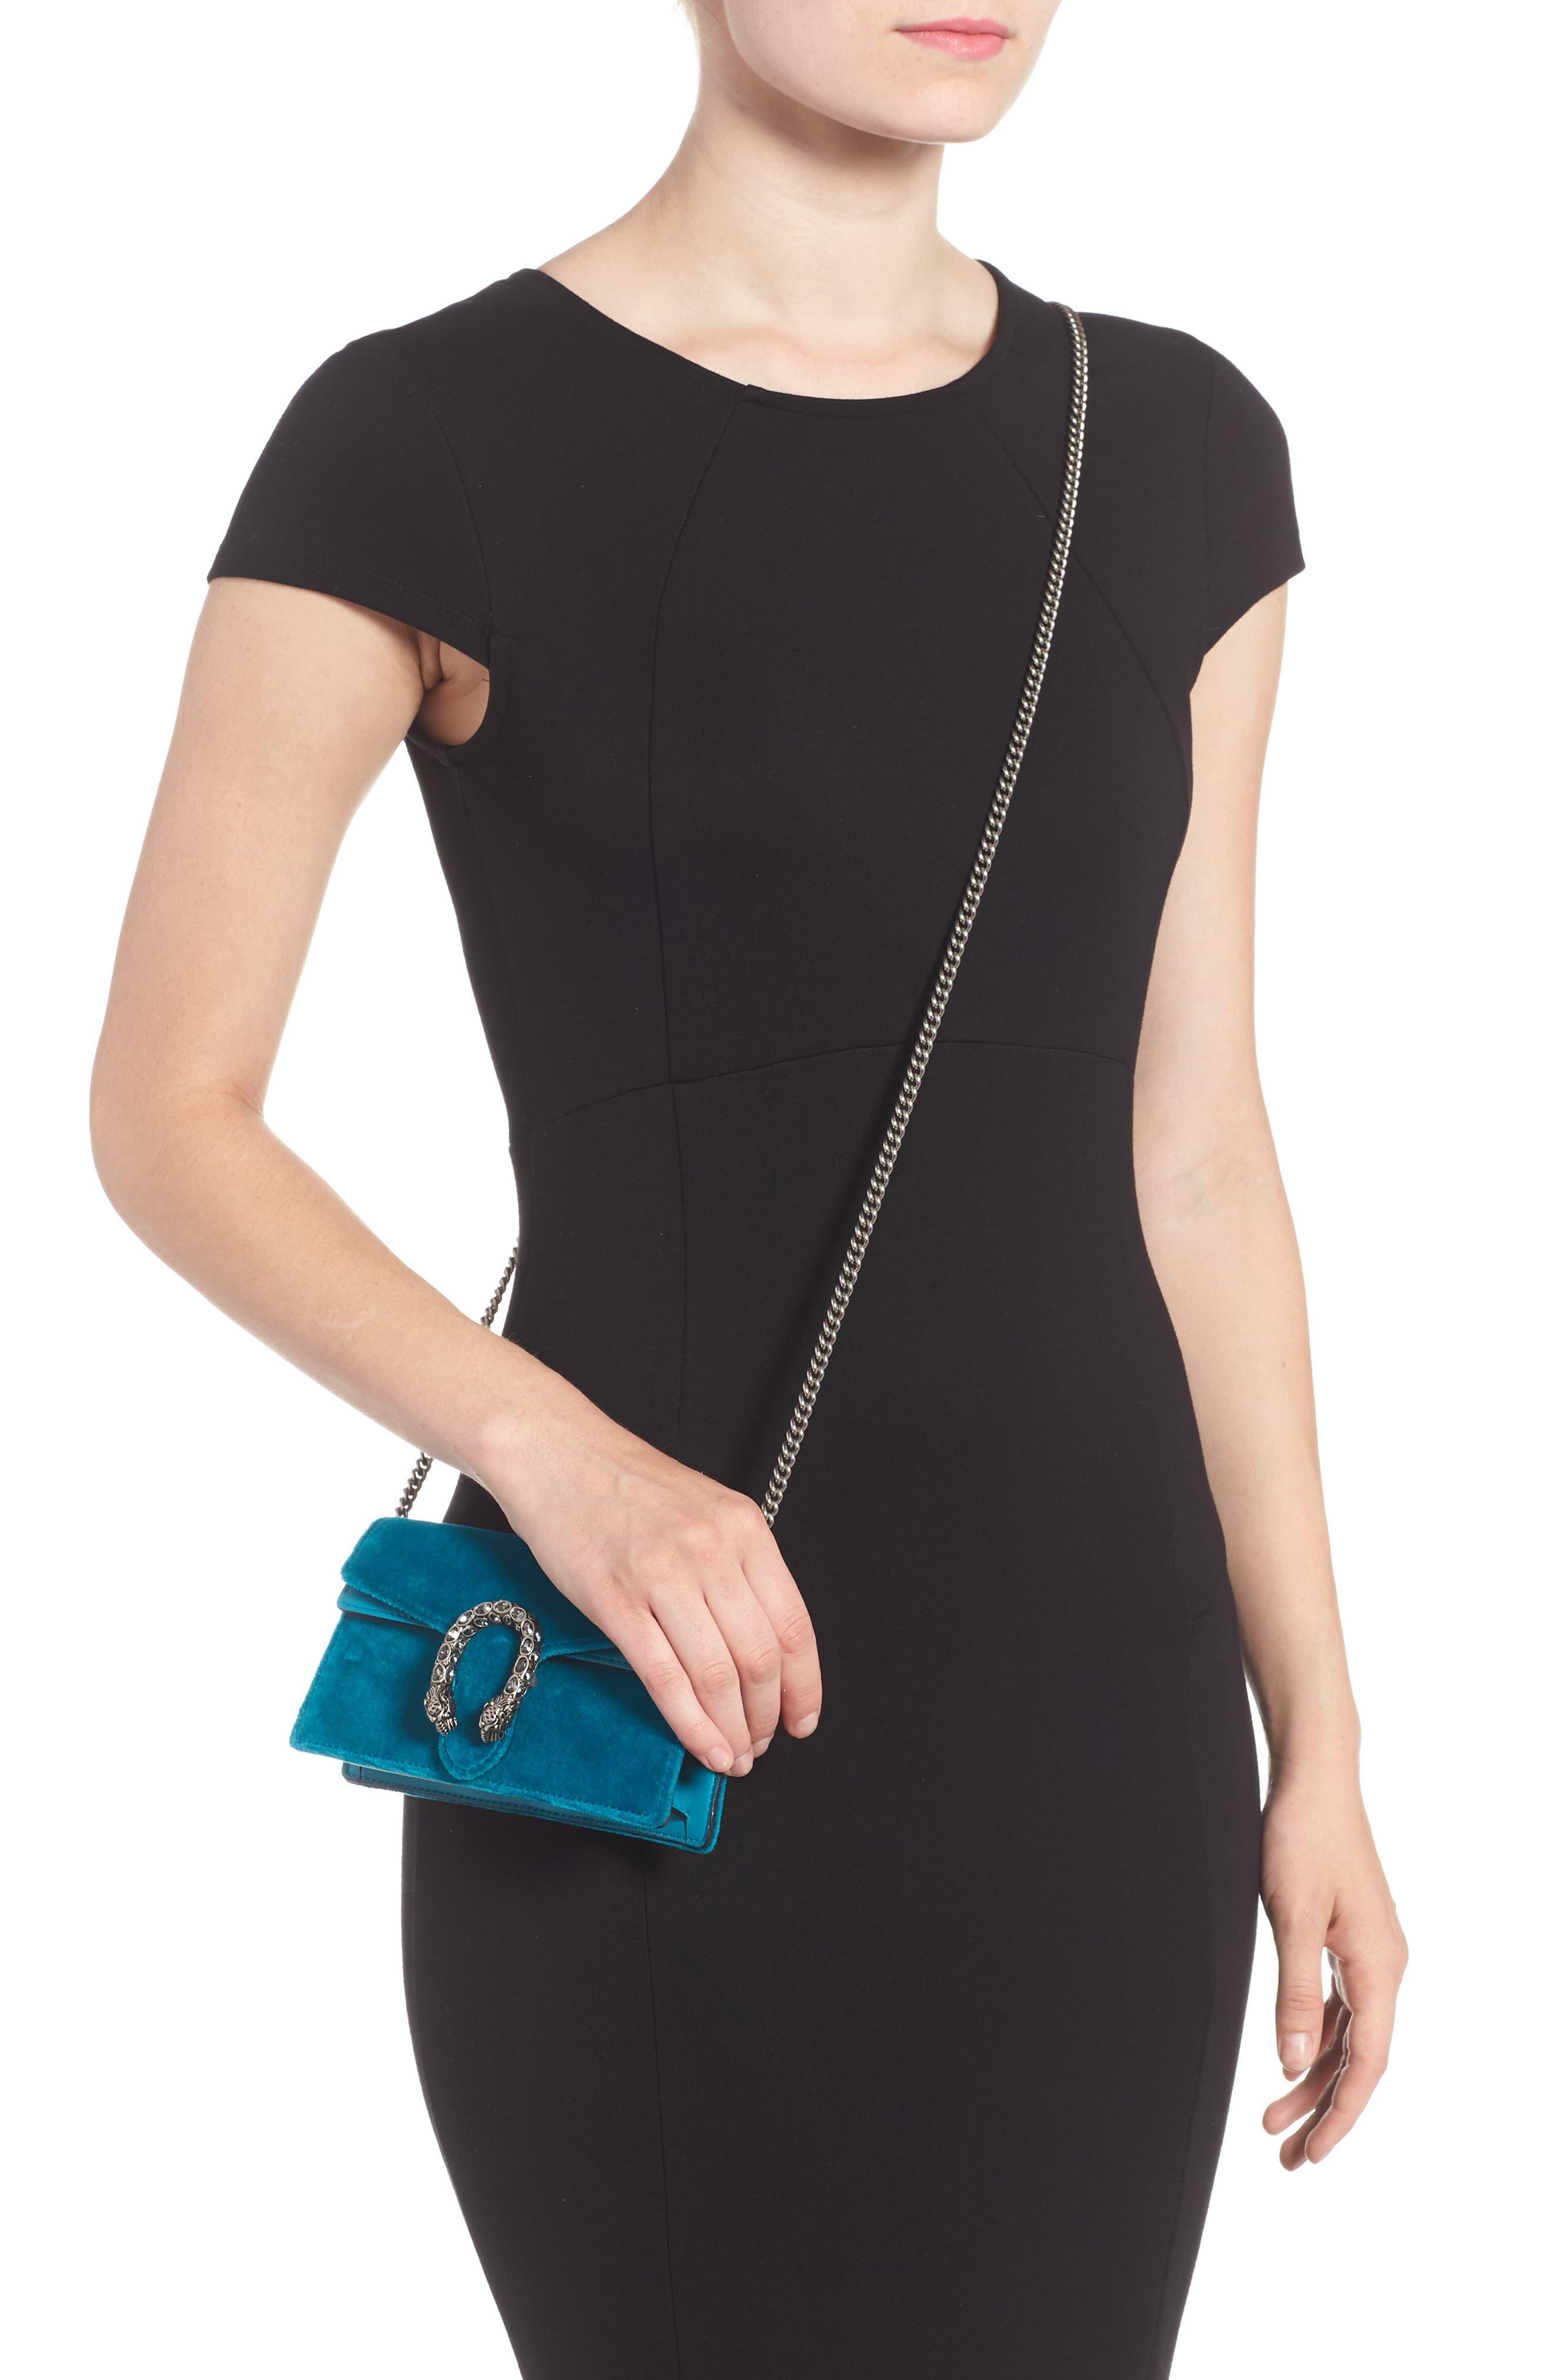 GUCCI, Super Mini Dionysus Velvet Shoulder Bag, Alternate thumbnail 2, color, PIVONE